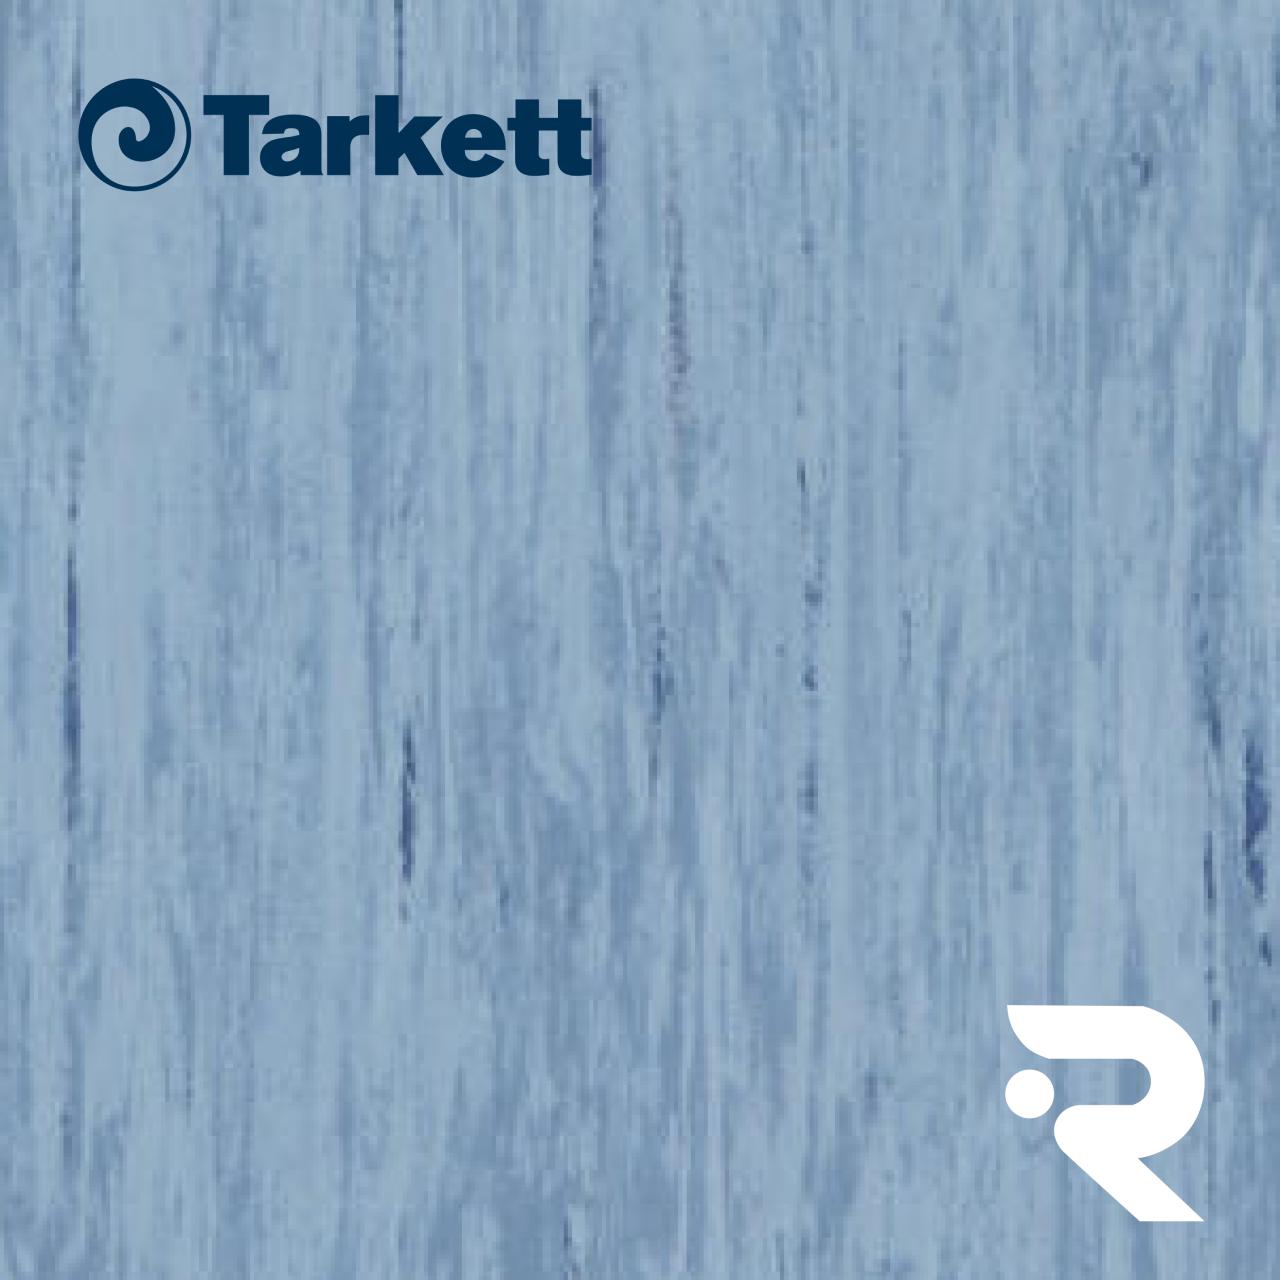 🏫 Гомогенный линолеум Tarkett   Standard MEDIUM BLUE 0492   Standard Plus 2.0 mm   610 х 610 мм